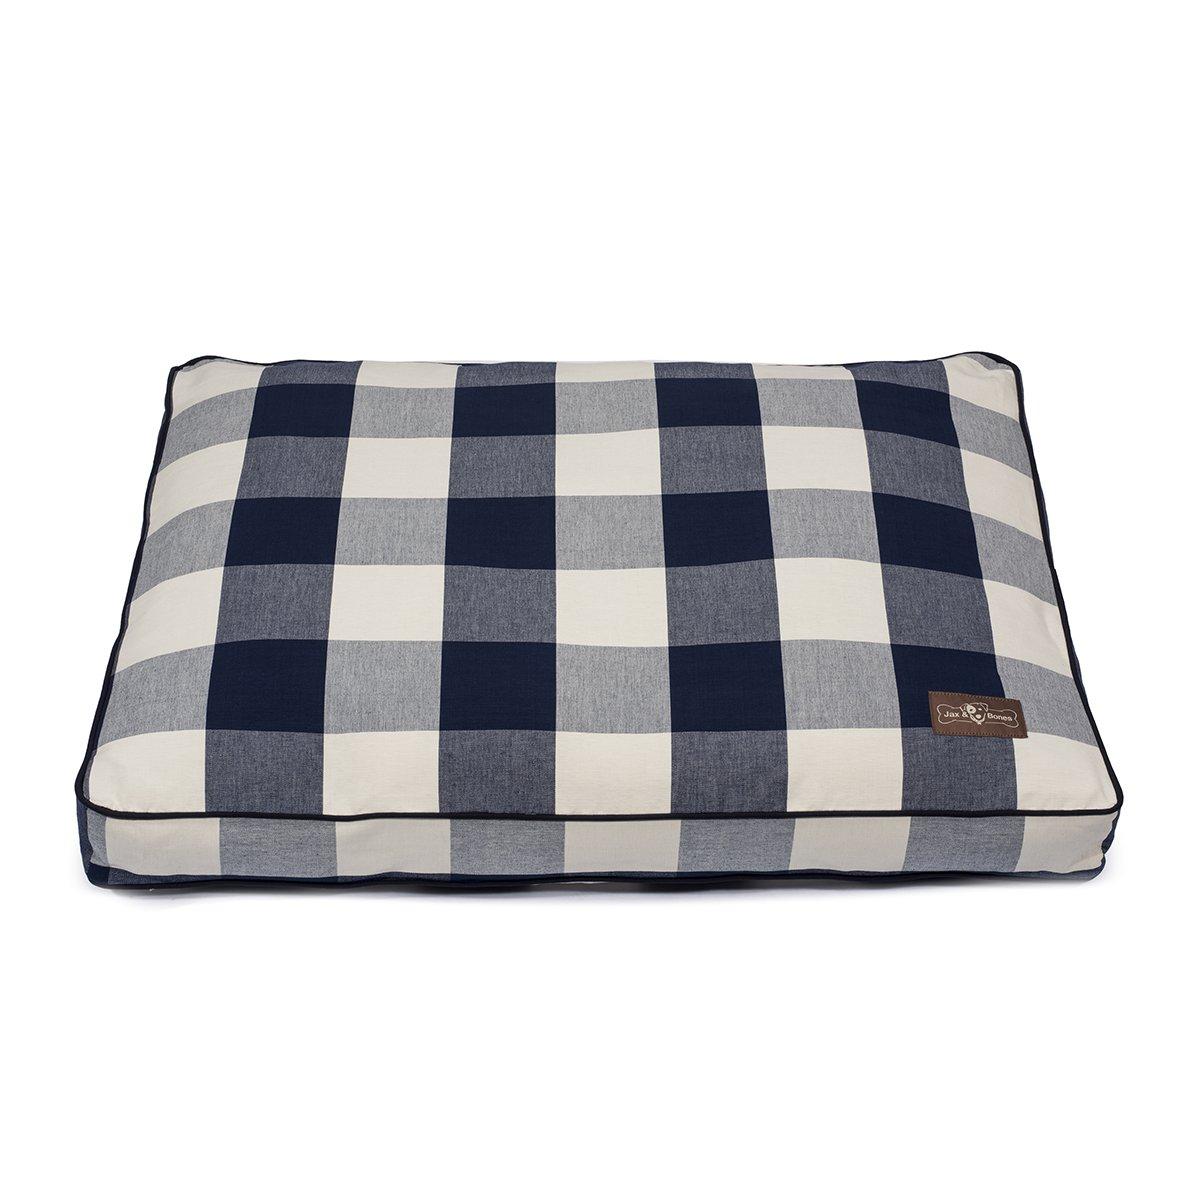 Buffalo Check Navy L Buffalo Check Navy L Jax and Bones Premium Cotton Blend Rectangular Pillow Bed, Large, Buffalo Check Navy